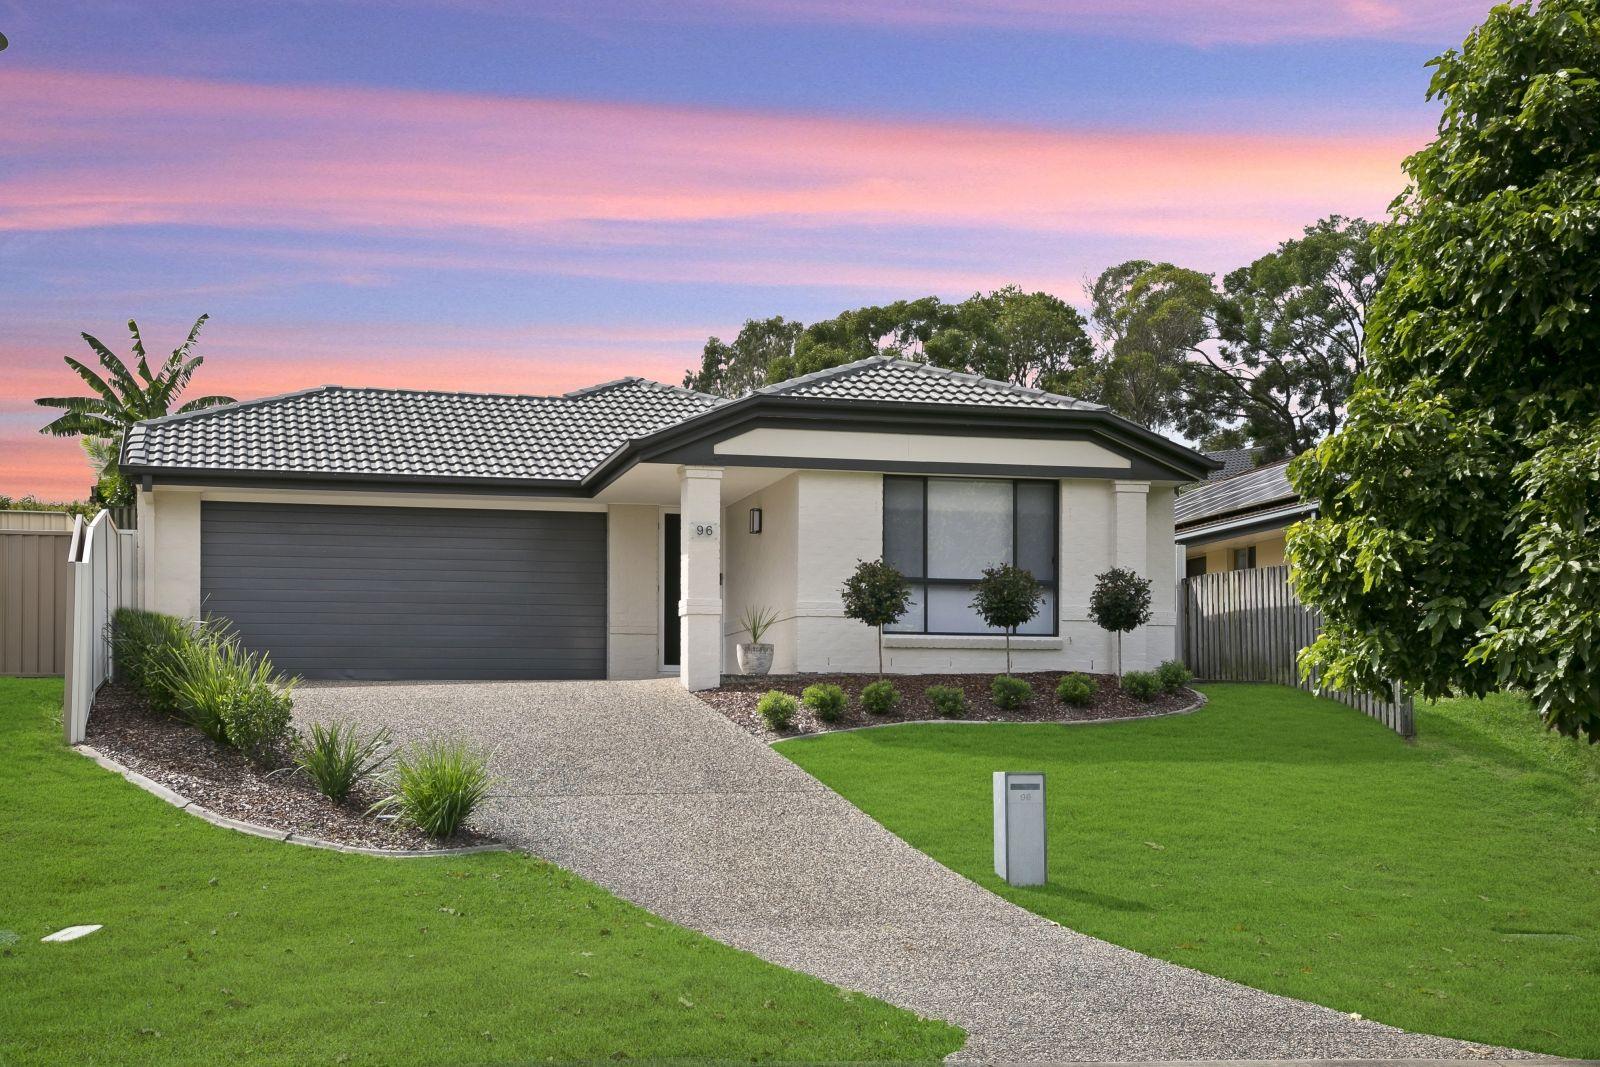 96 Lambor Drive, Mudgeeraba QLD 4213, Image 0